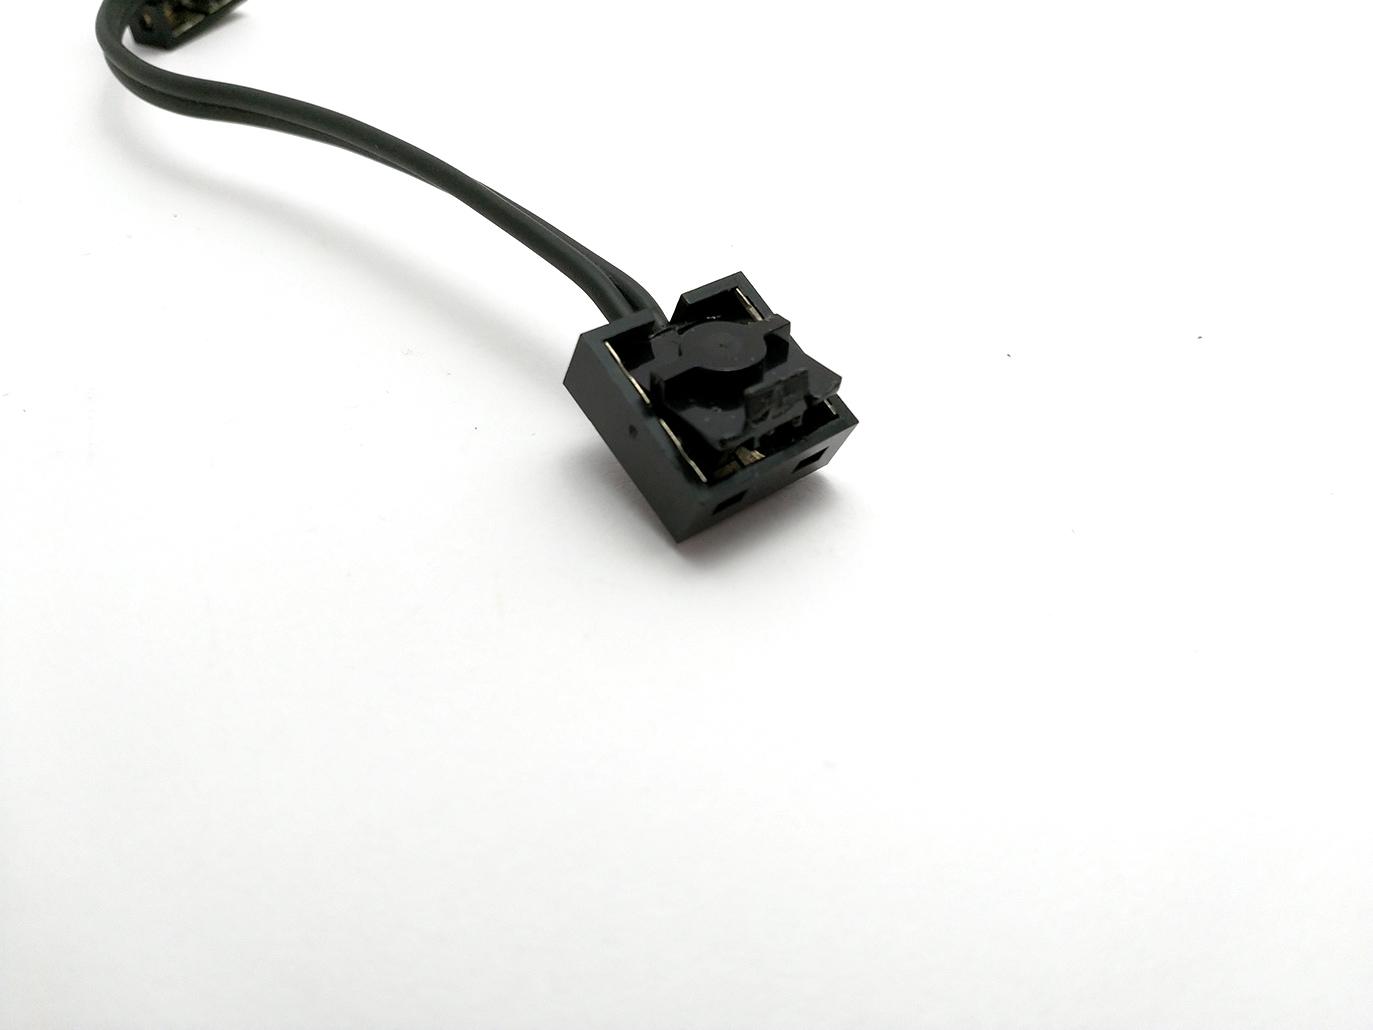 LEGO Technic 9V Kabel Schritt 1 Kabel geöffnet